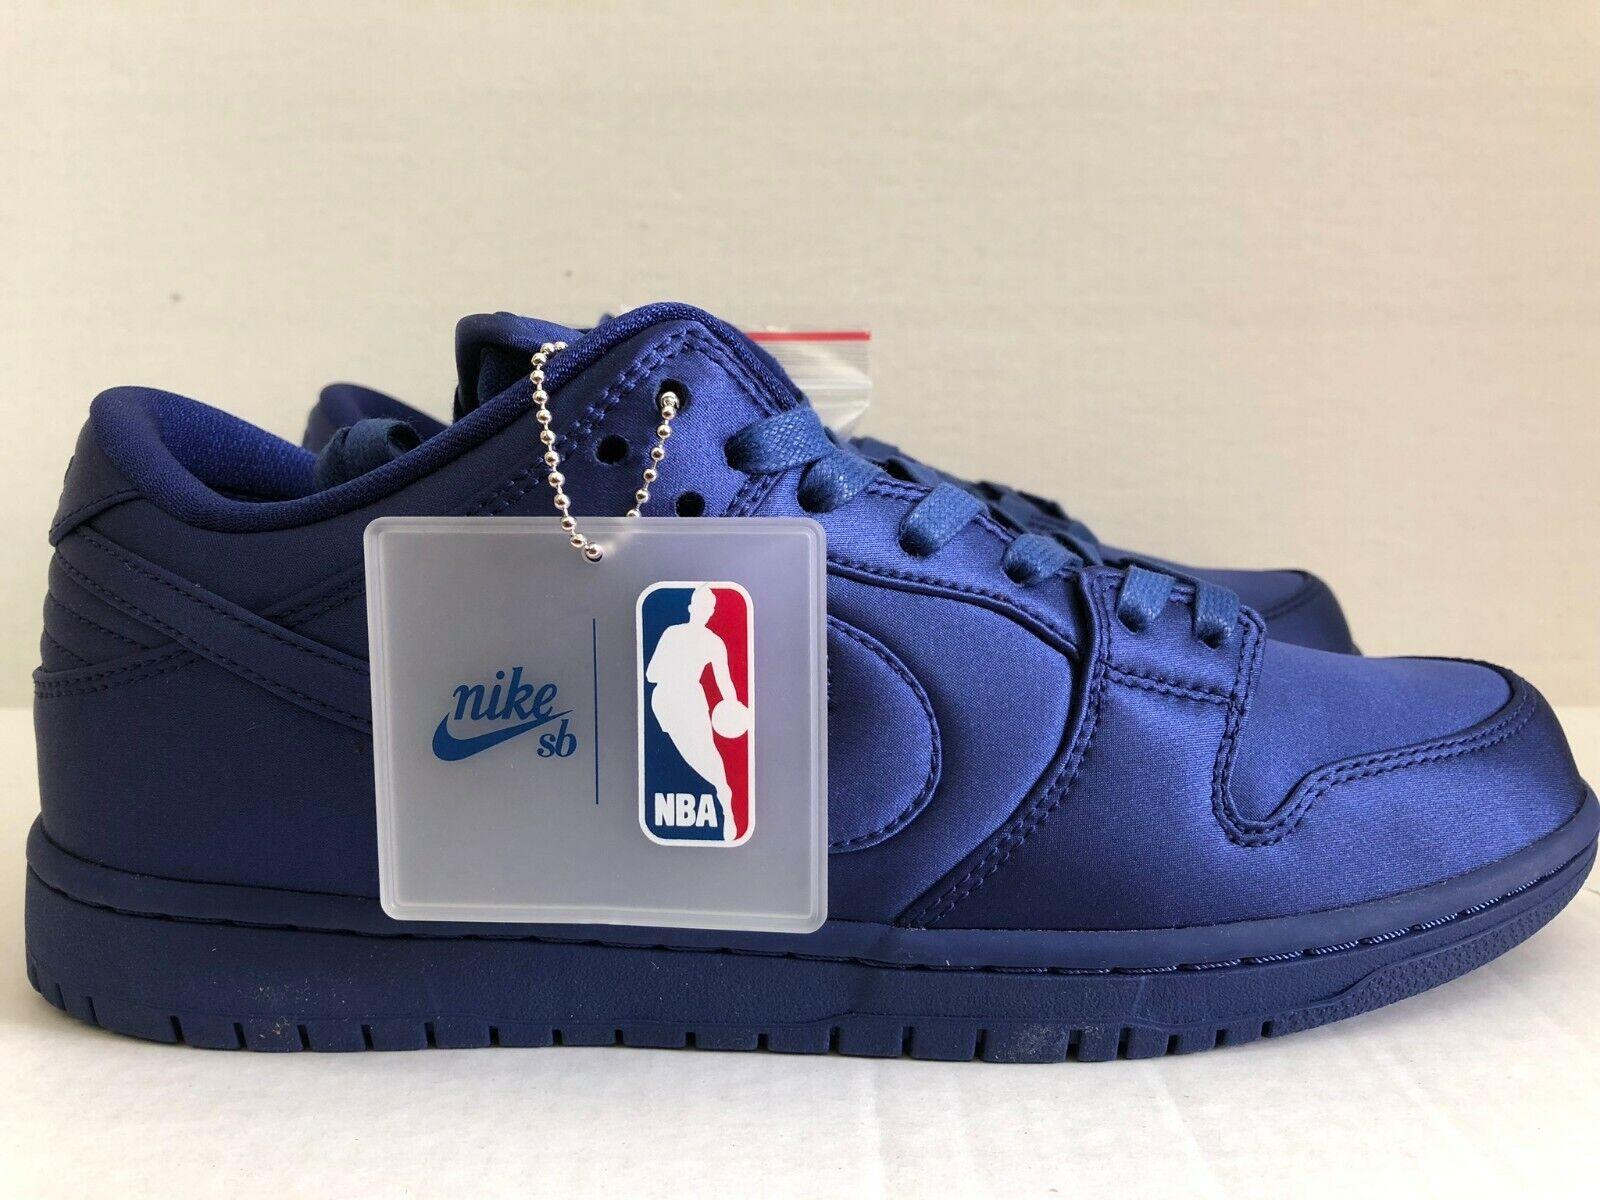 info for 5cb53 a6f88 Nike SB Dunk Low TRD x NBA Satin Deep Deep Deep Royal blueee ...